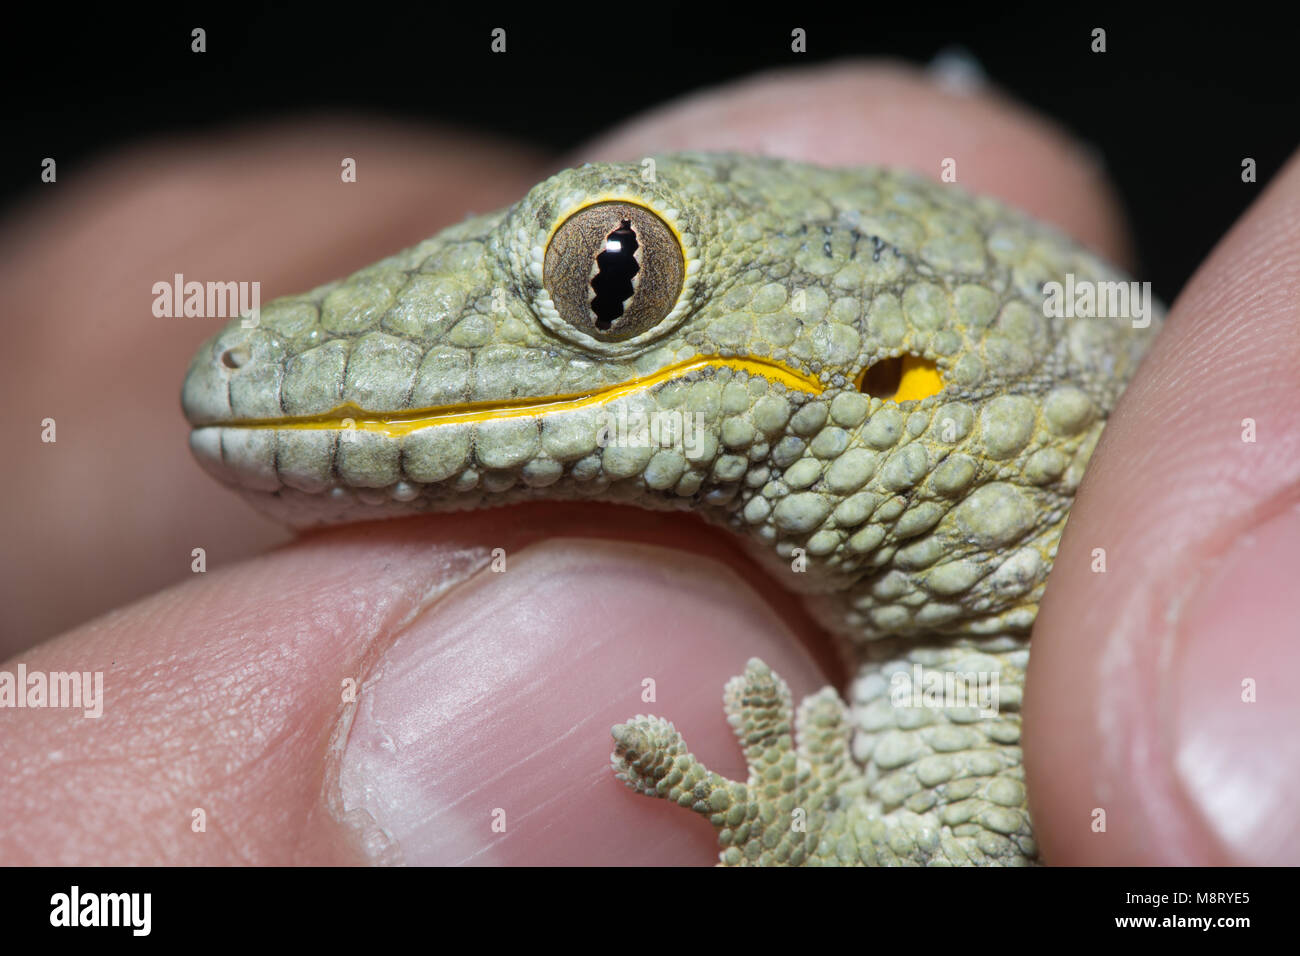 Speed dating hamburg gecko